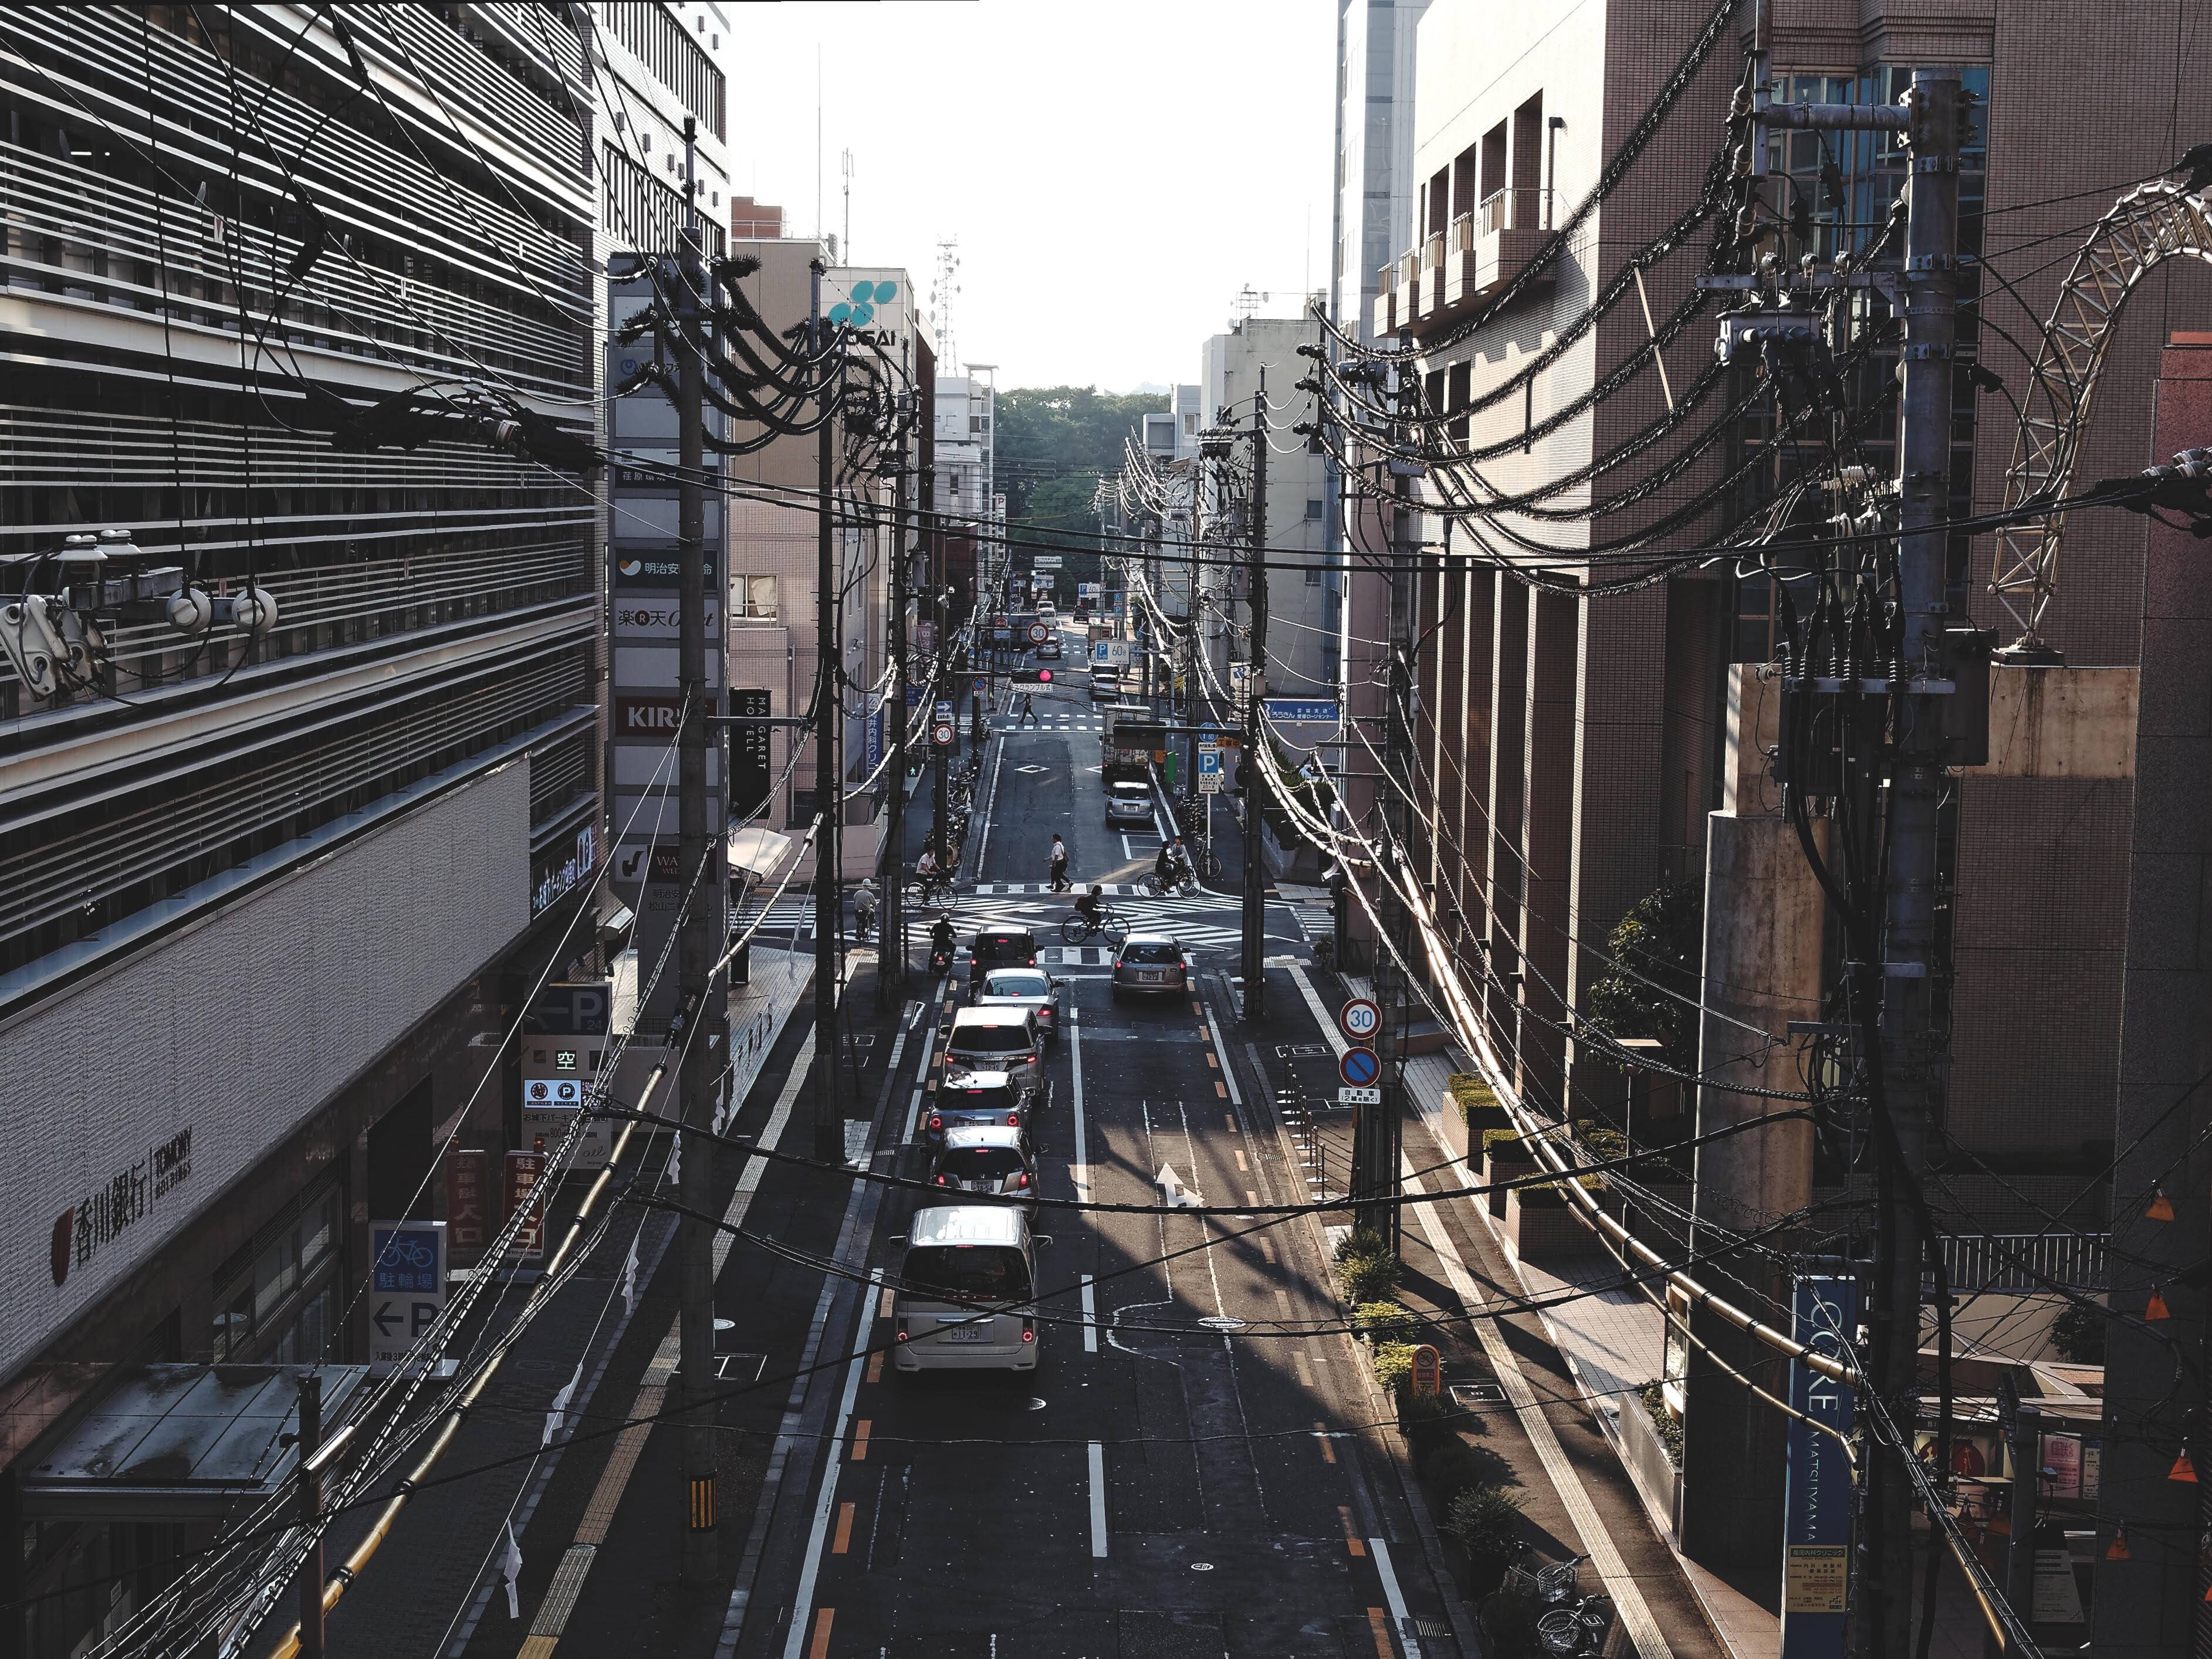 f:id:yuuki89:20190303180031j:image